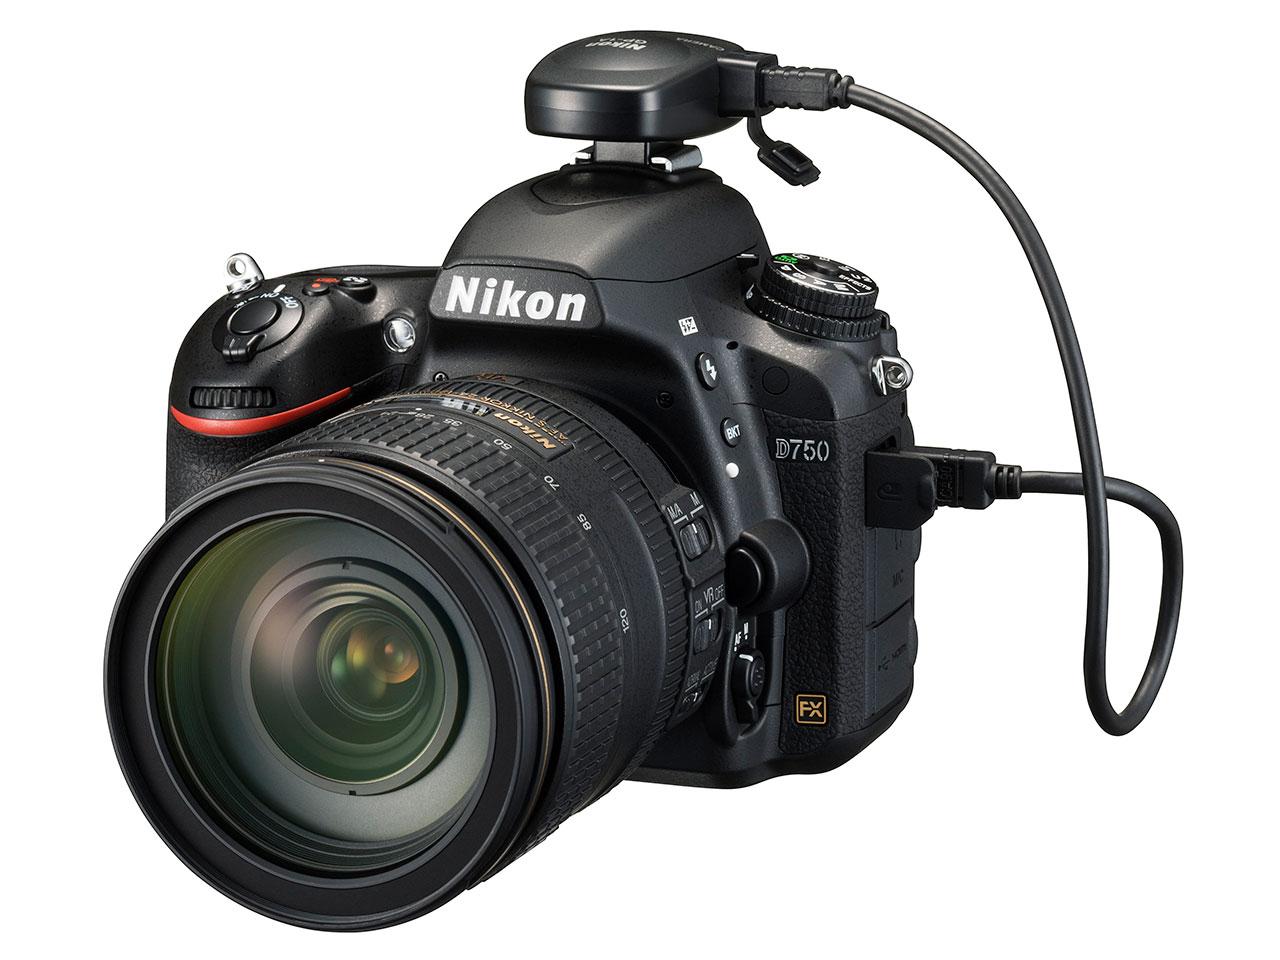 Nikon D750 Review: Digital Photography Review